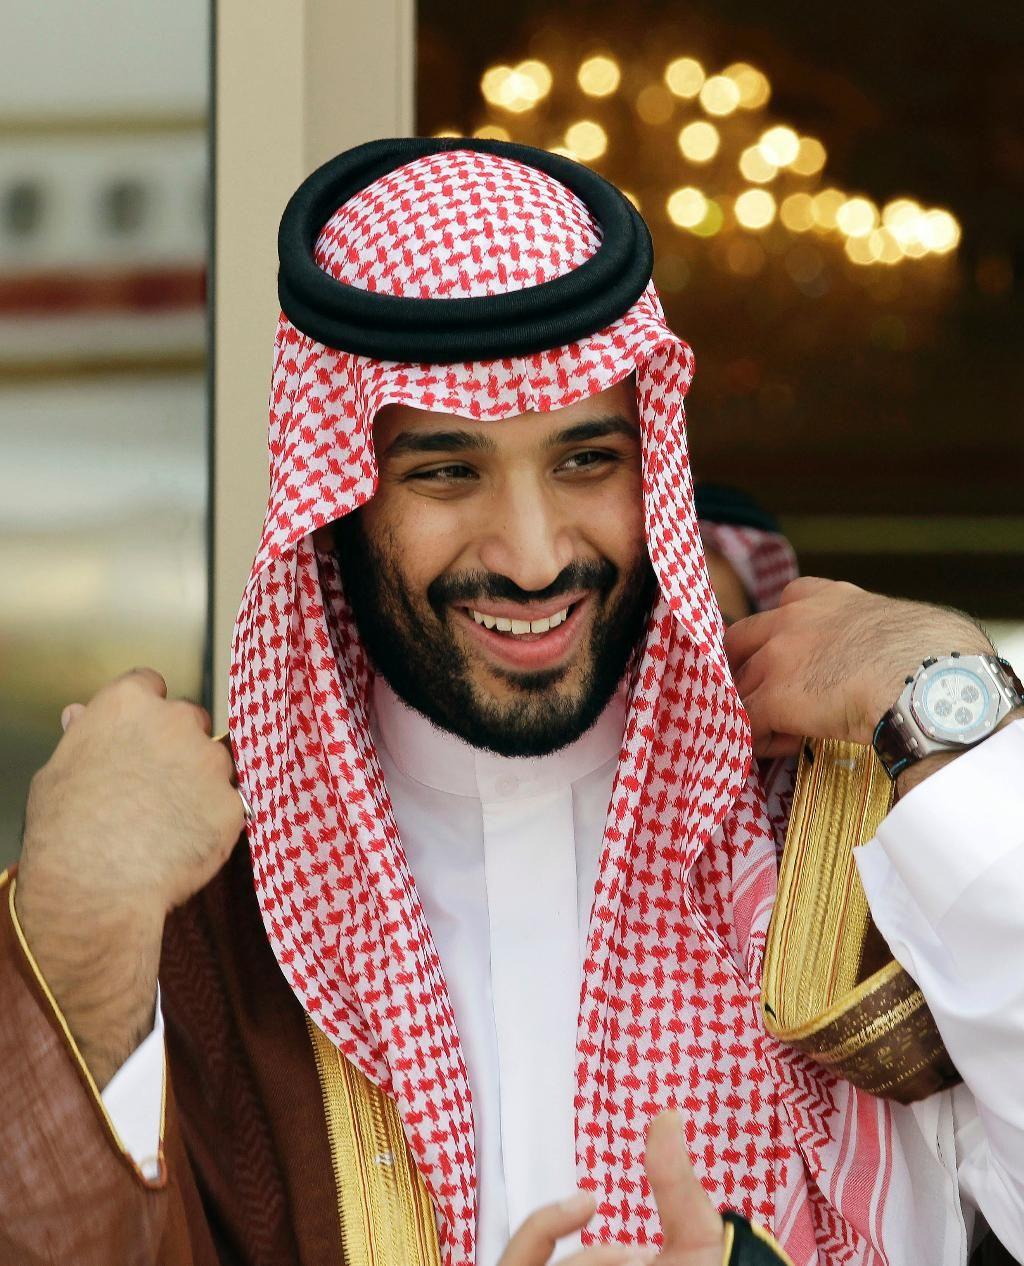 Fallout Over Saudi Activist S Disappearance Puts Spotlight On